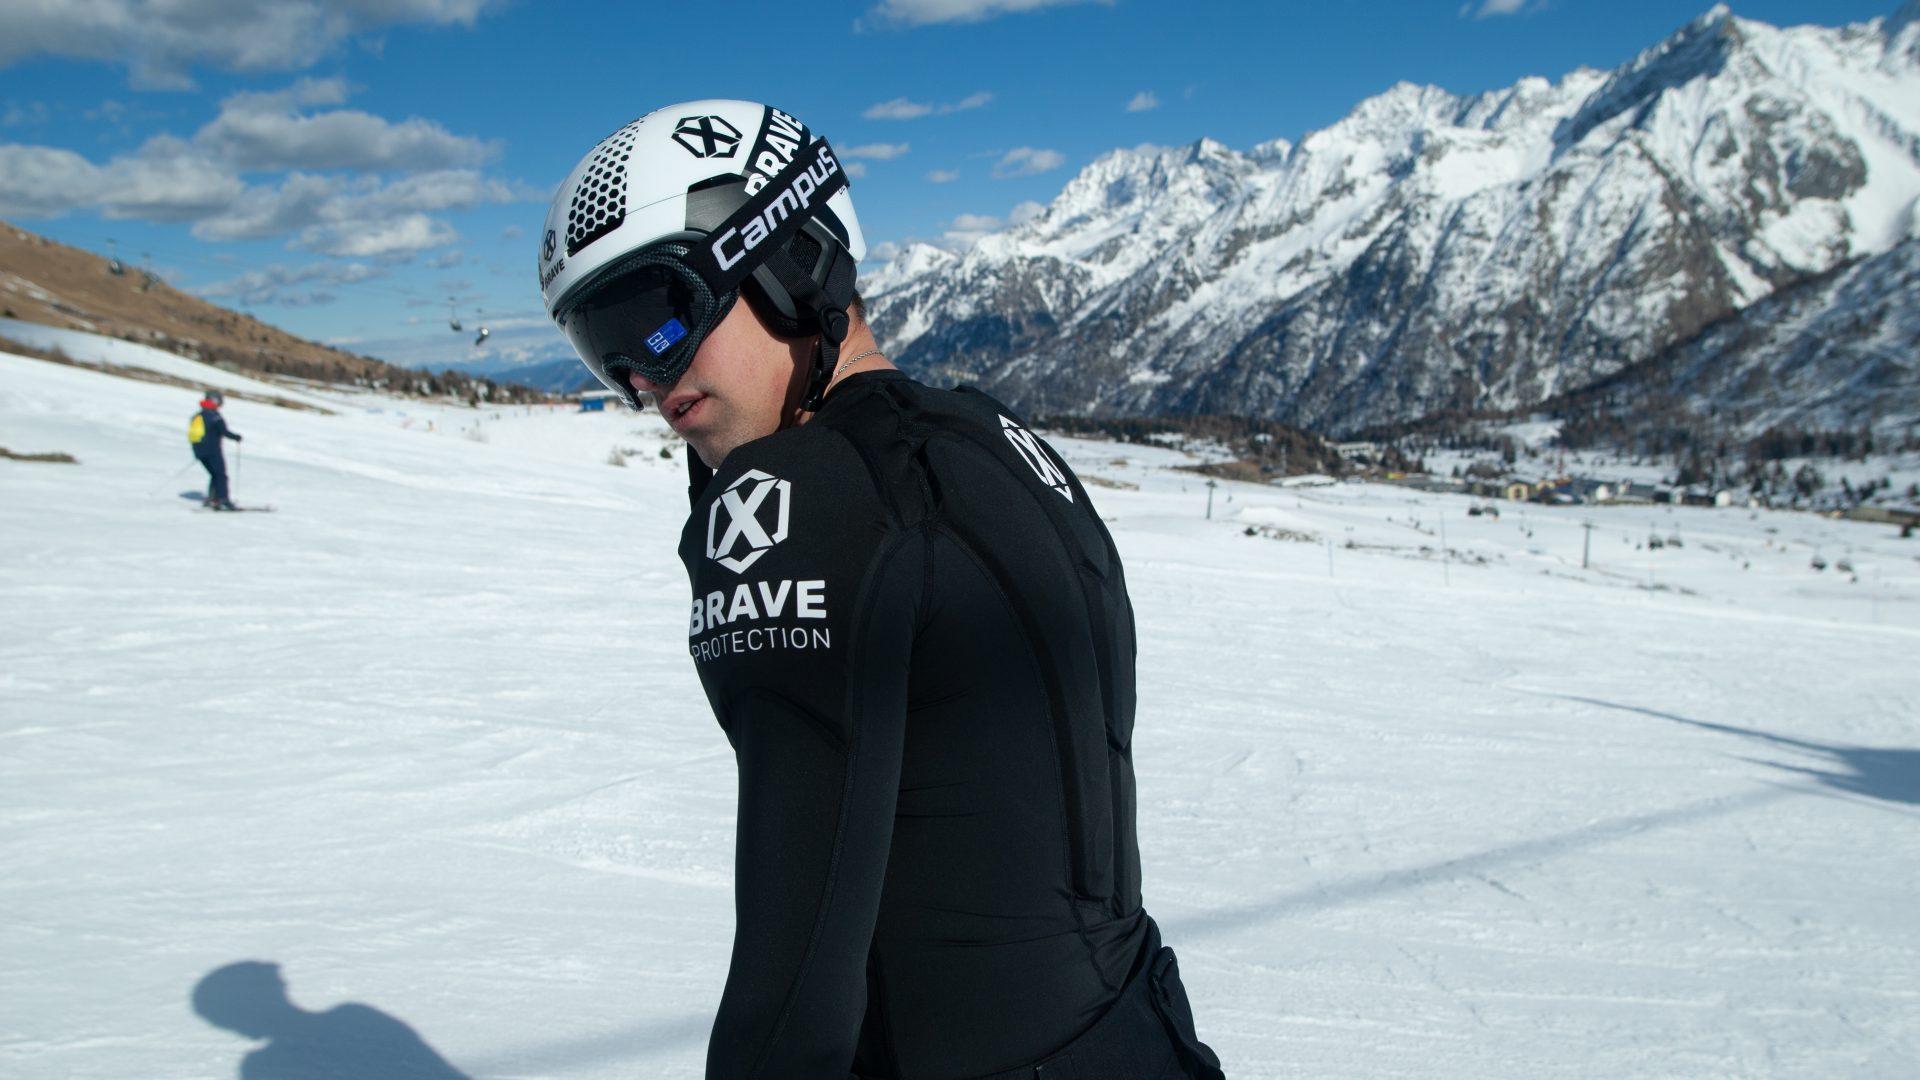 X Brave 21/22 Snow Protection